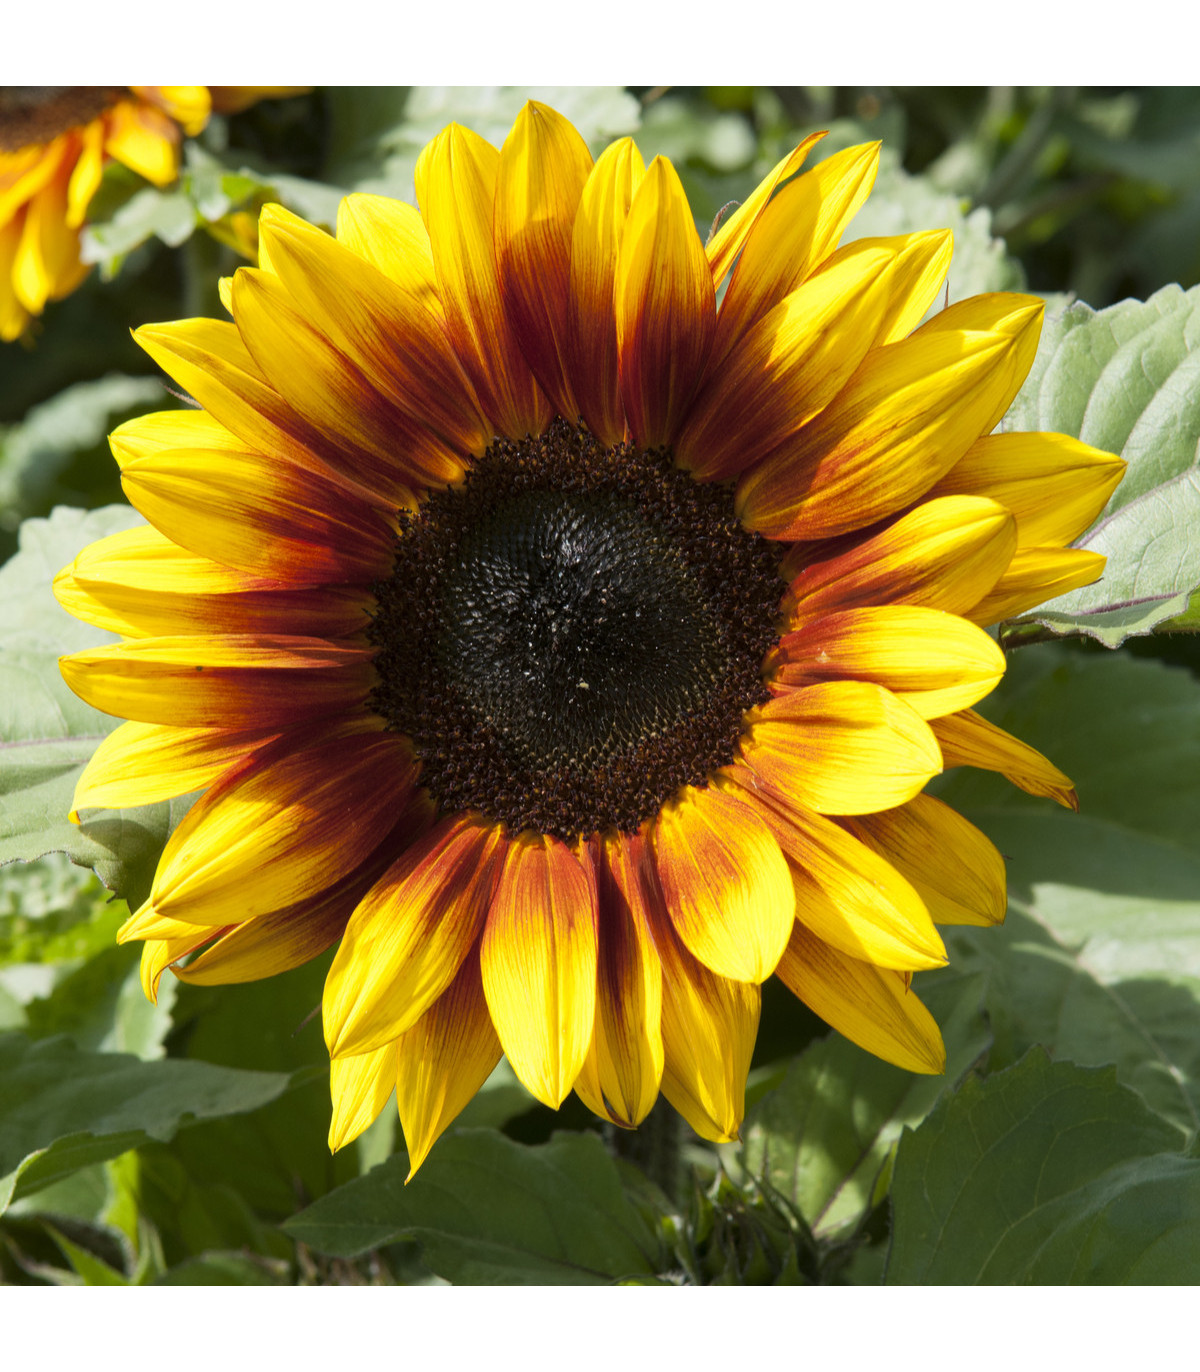 Slnečnica F1 Surprise - semená slnečnice - Helianthus annuus - 7 ks